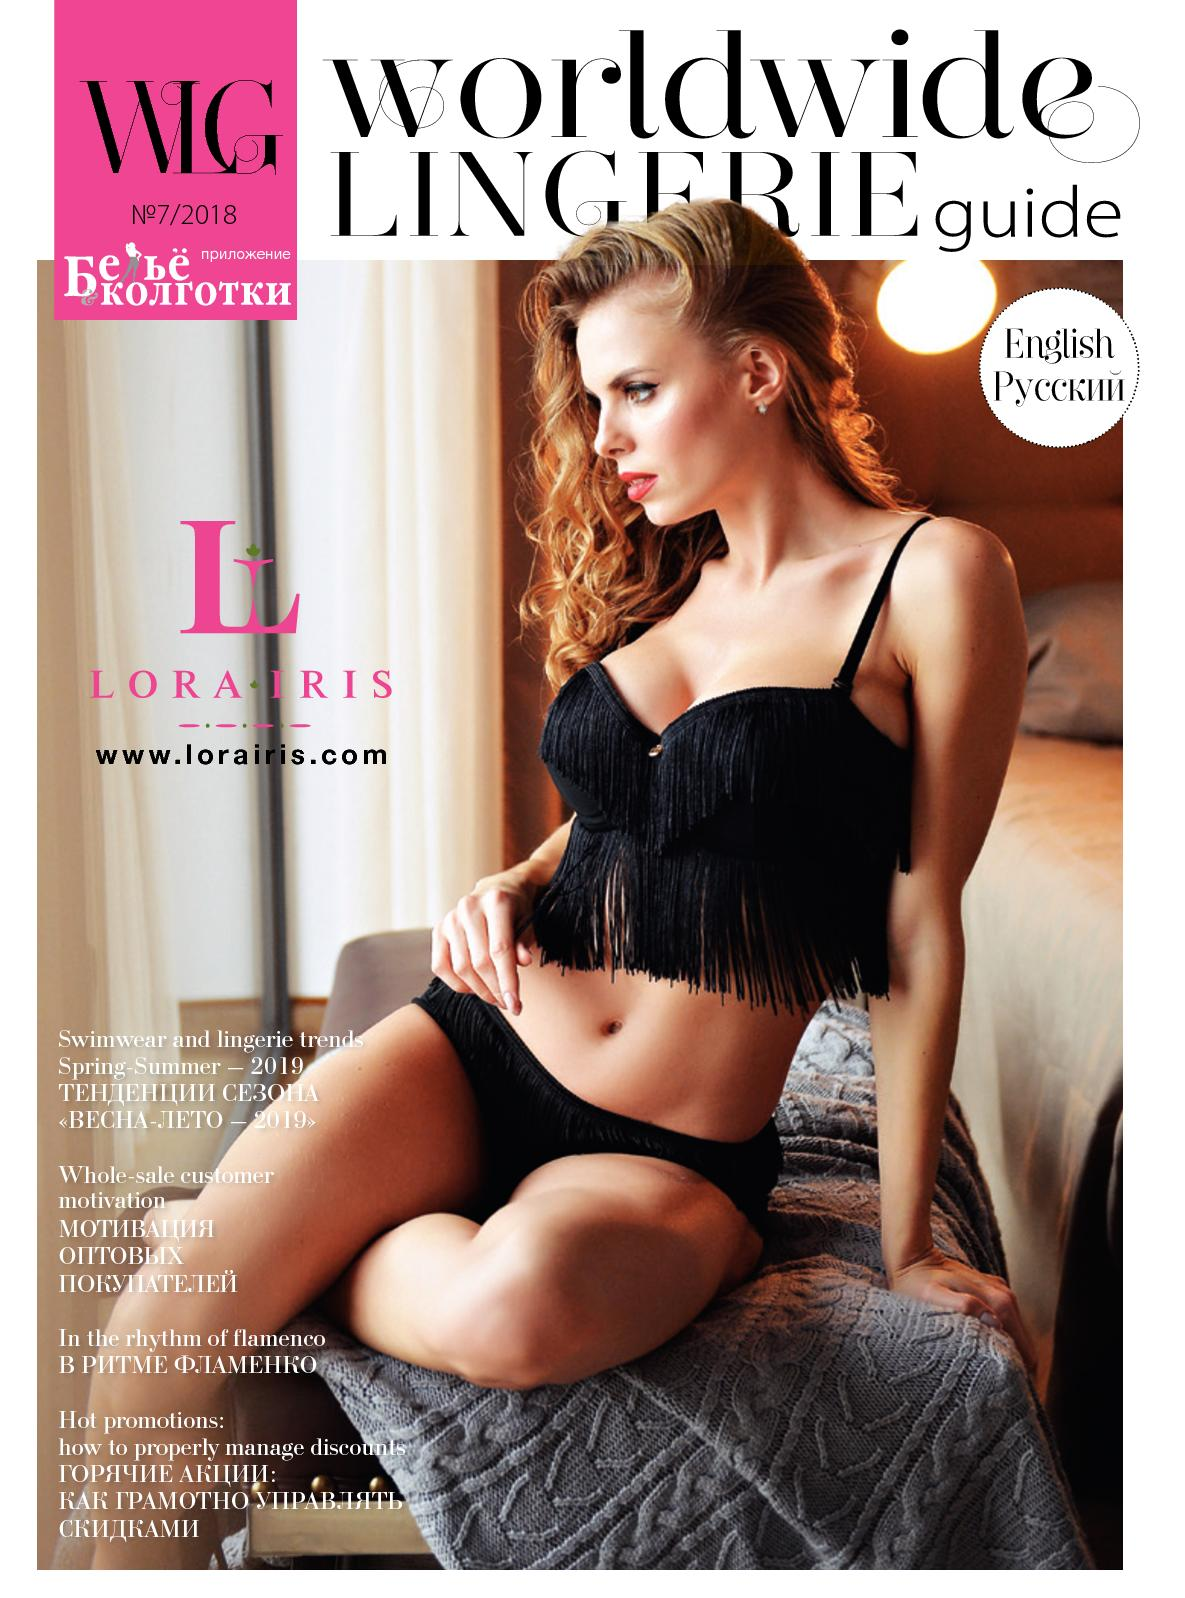 Calaméo - Worldwide Lingerie Guide 7 94ae6bd77ba